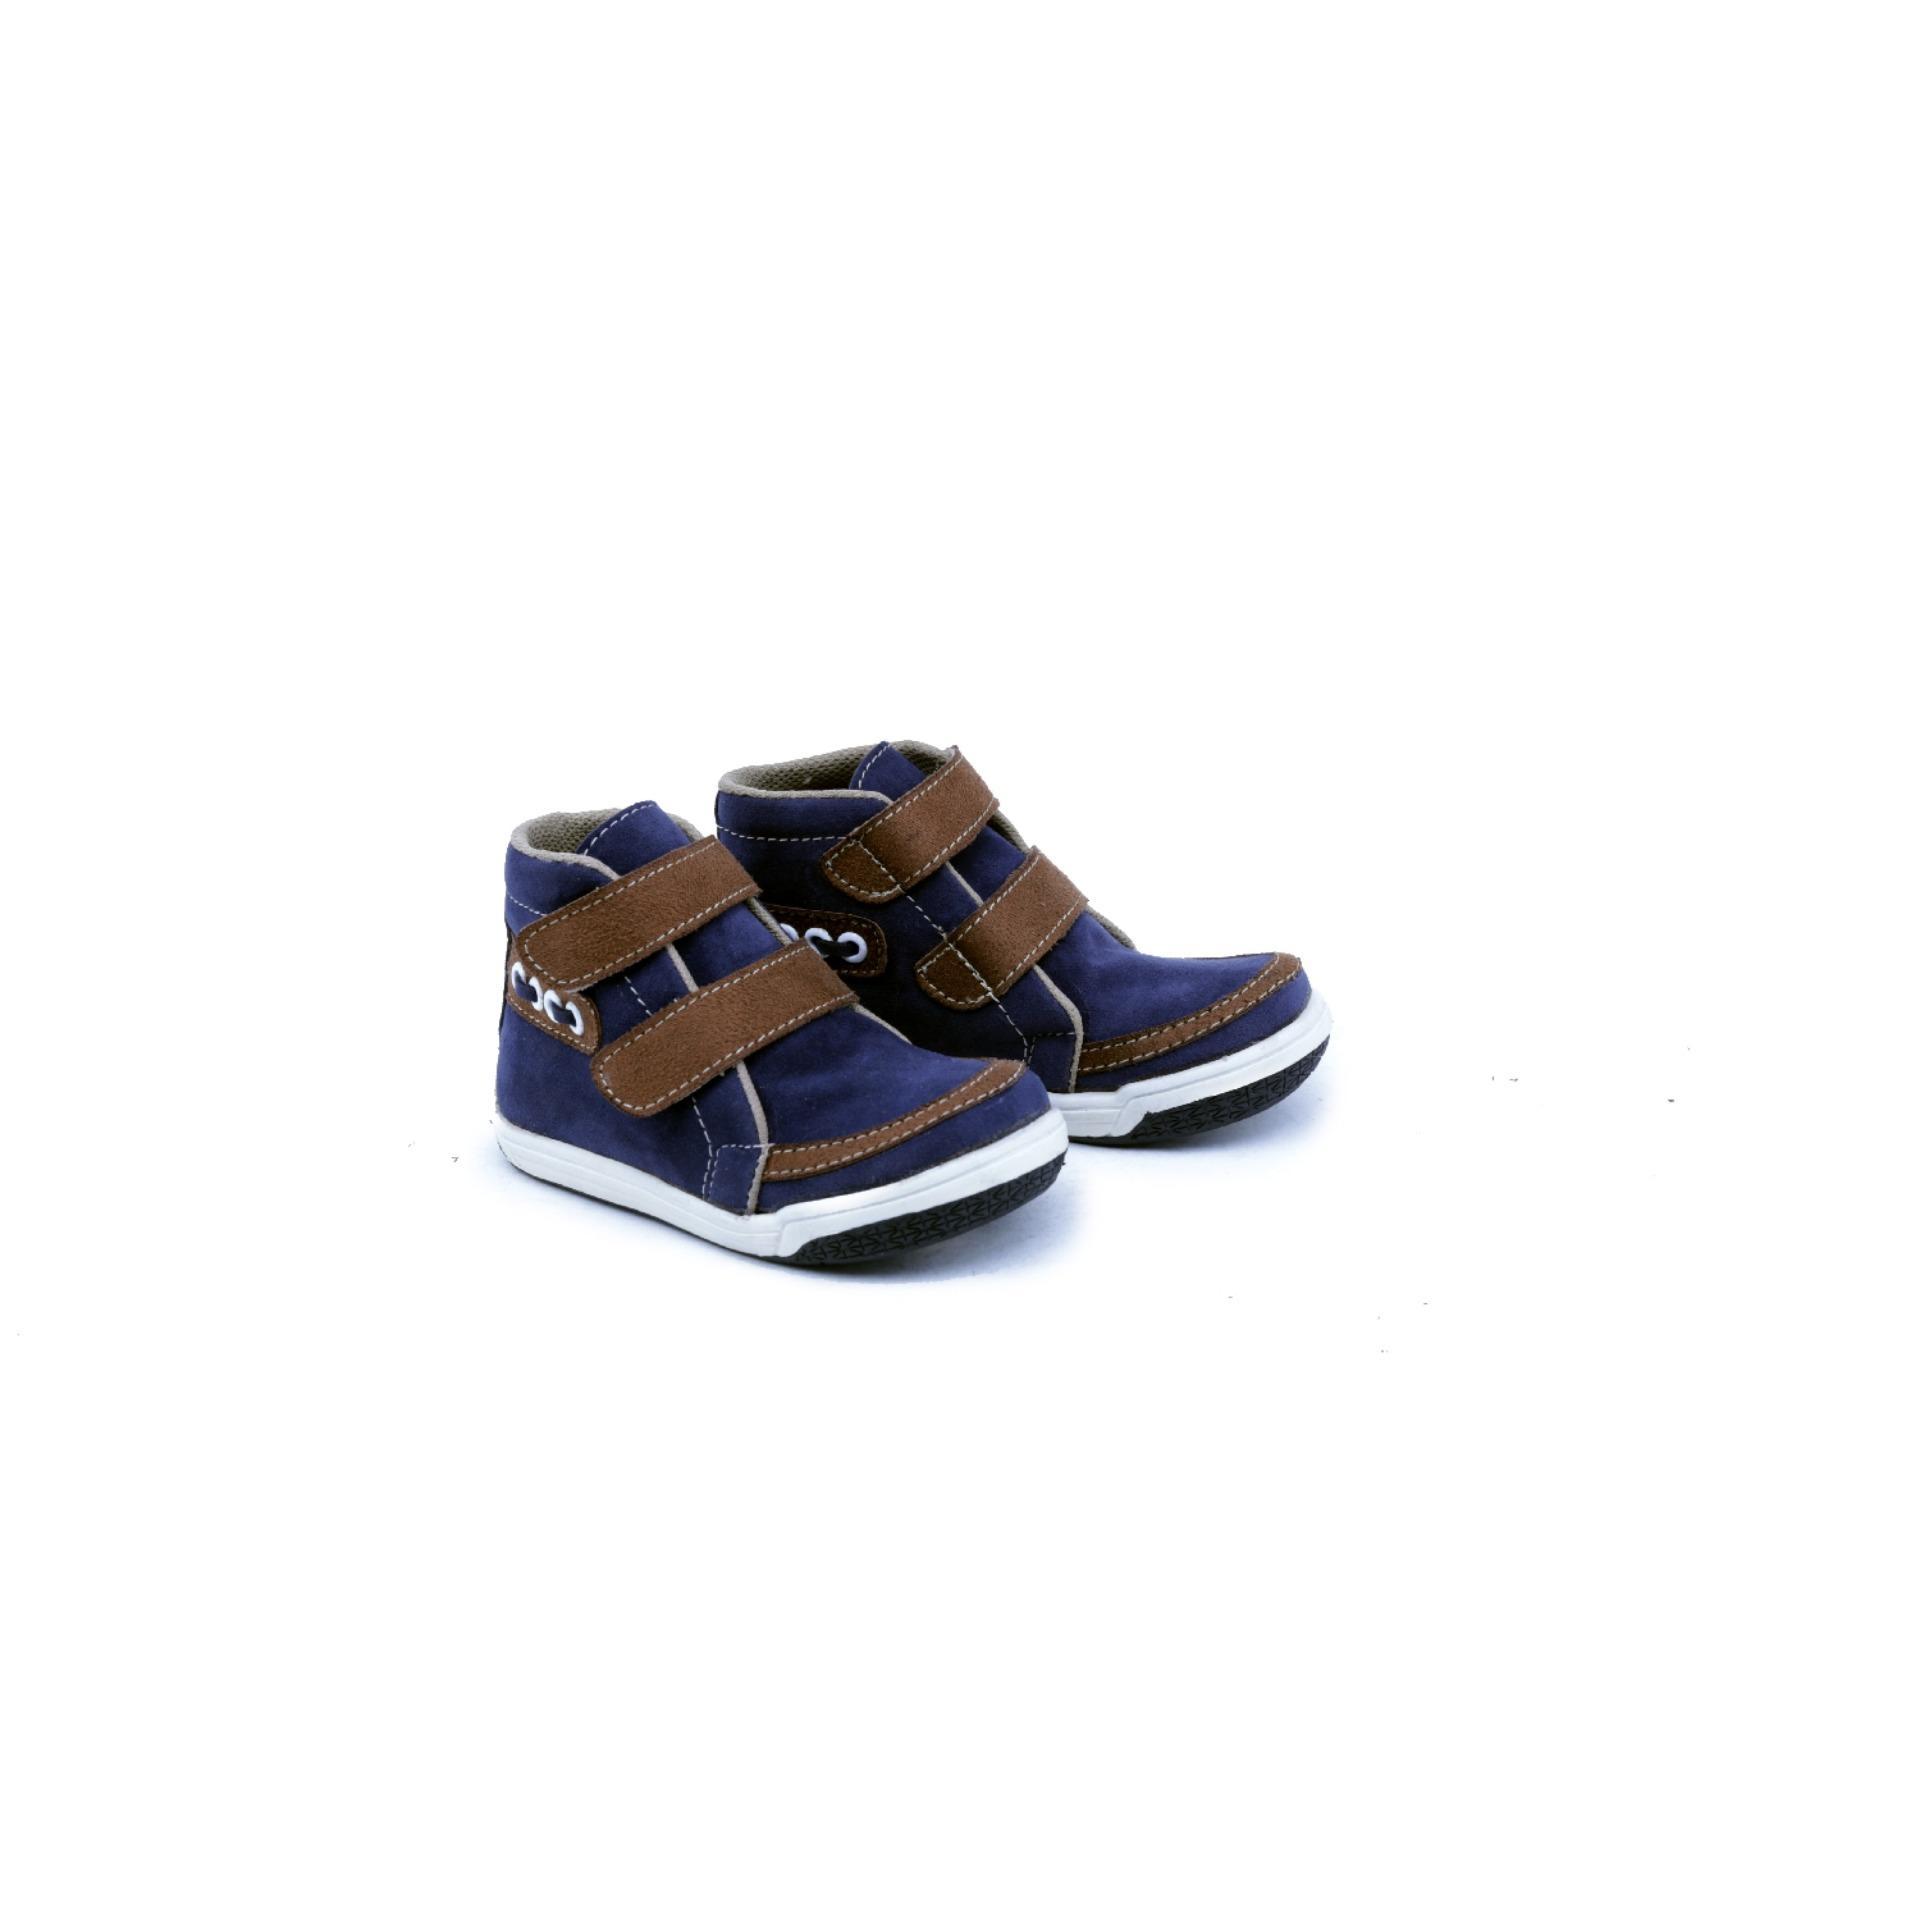 Buy Sell Cheapest Sneakers Casual Bandung Best Quality Product Katalog Sepatu Cowo Gars Garsel Produk Shoes Gih 9515 Anak Sneaker Boot Laki Sintetis